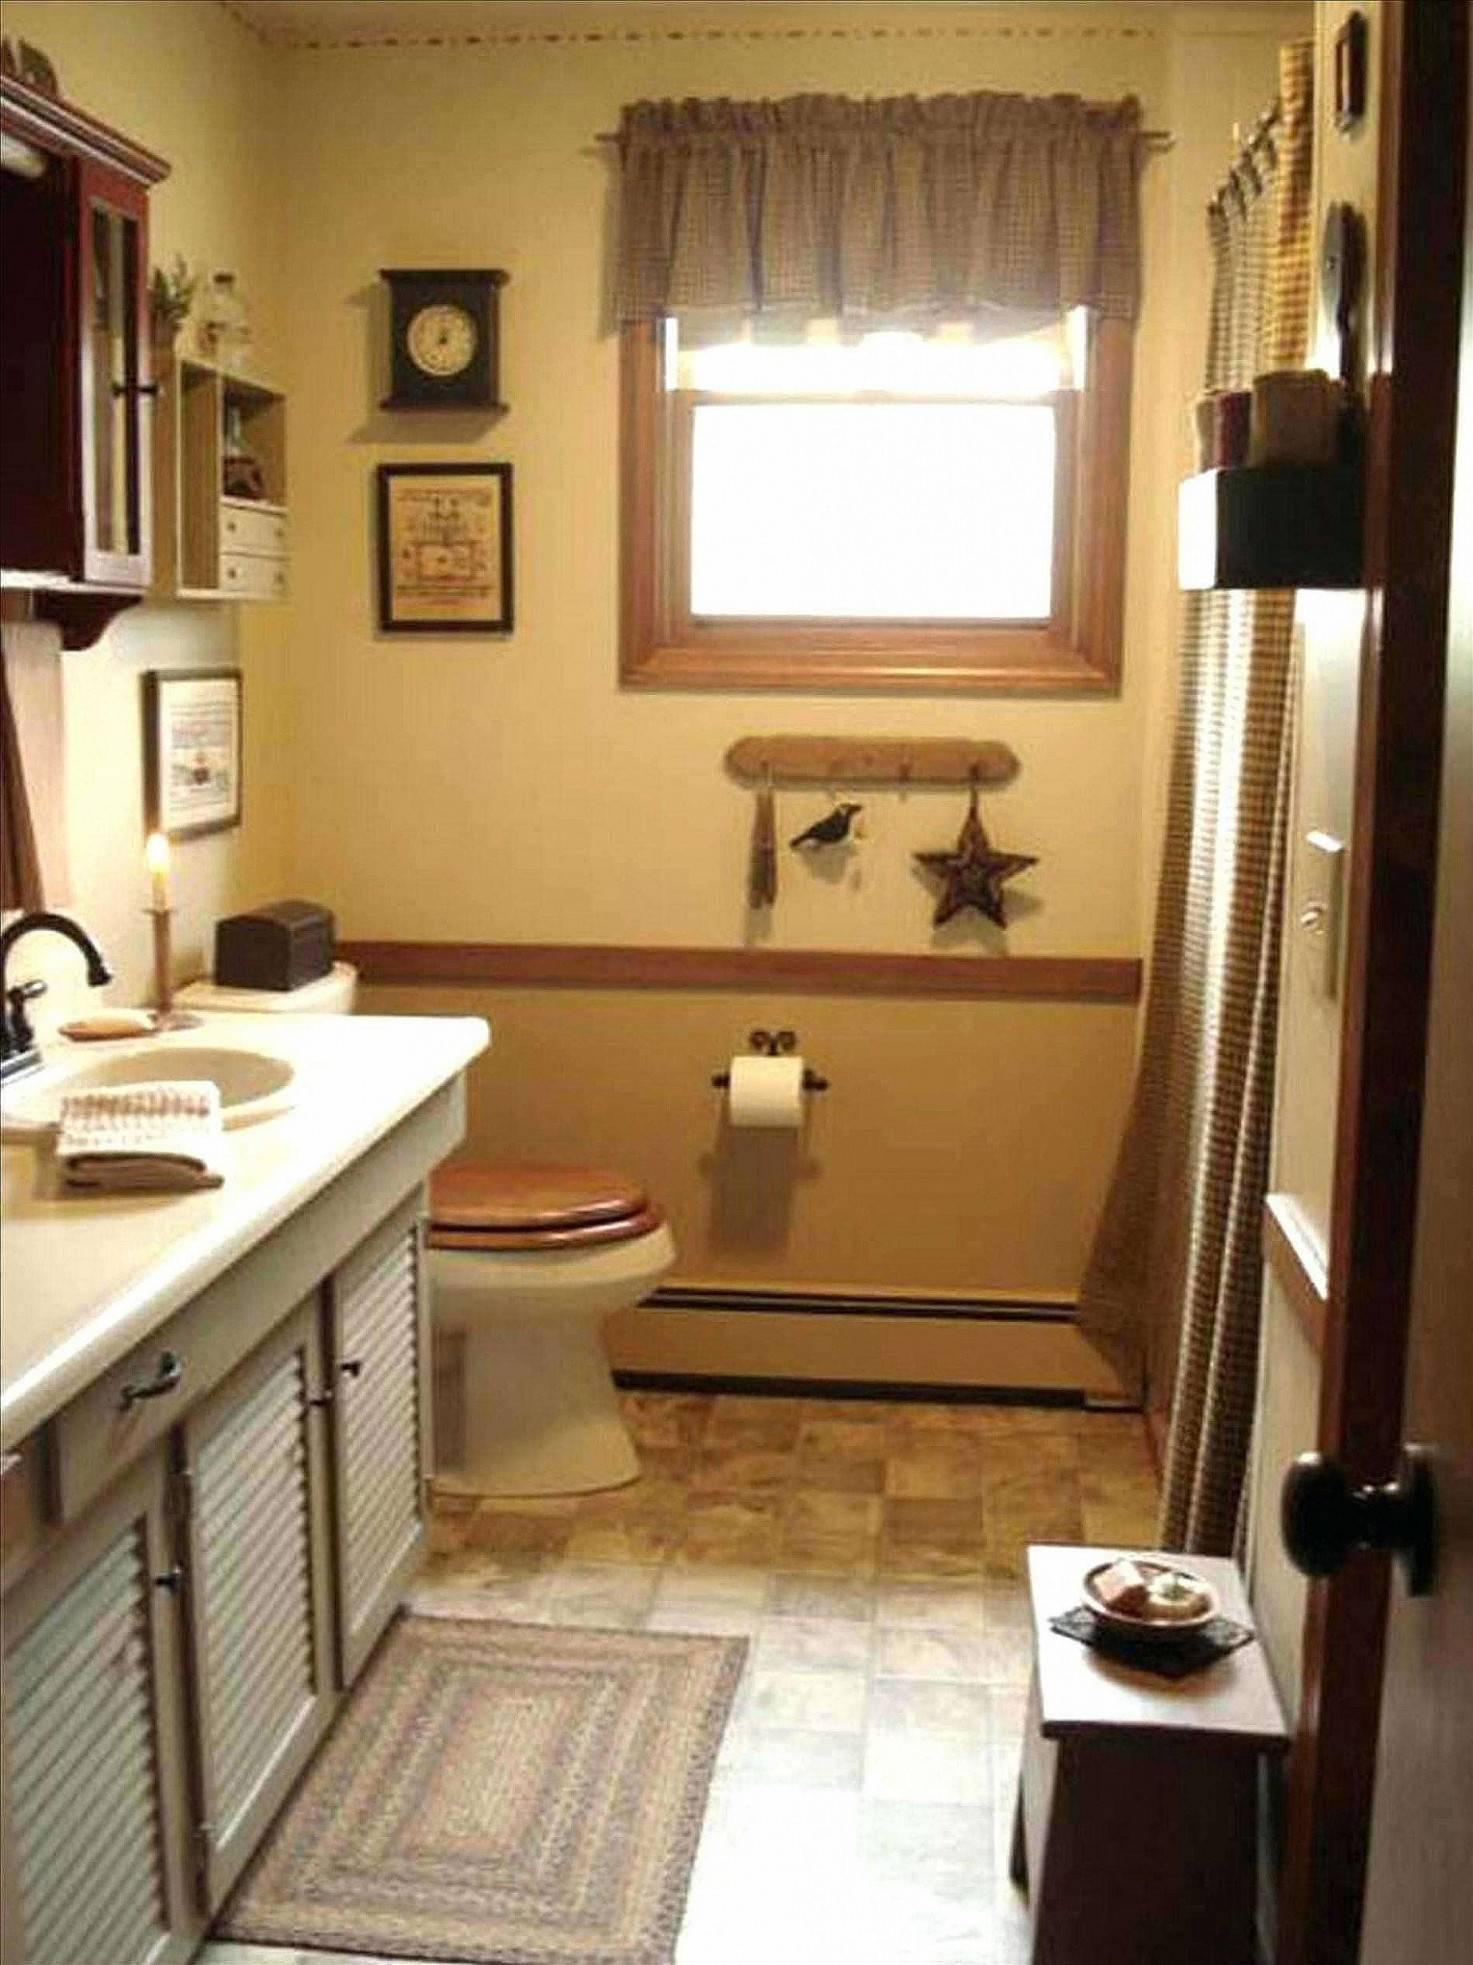 bathroom cabinets diy new awesome bathroom storage ideas 50ger of bathroom cabinets diy